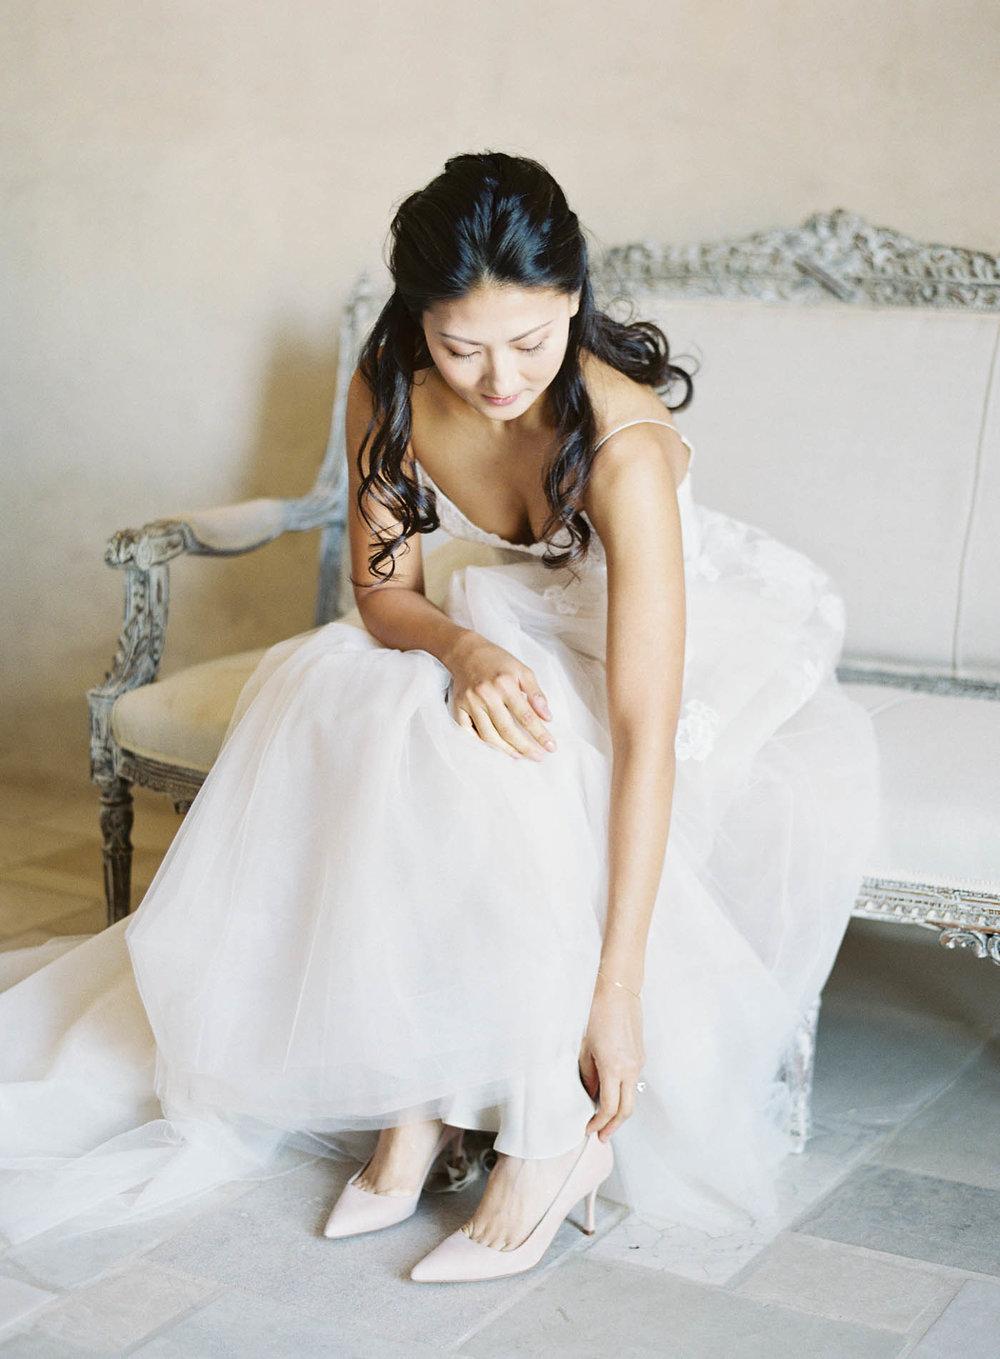 sunstone-villa-wedding-5-Jen_Huang-RD-19-Jen_Huang-009579-R1-007.jpg